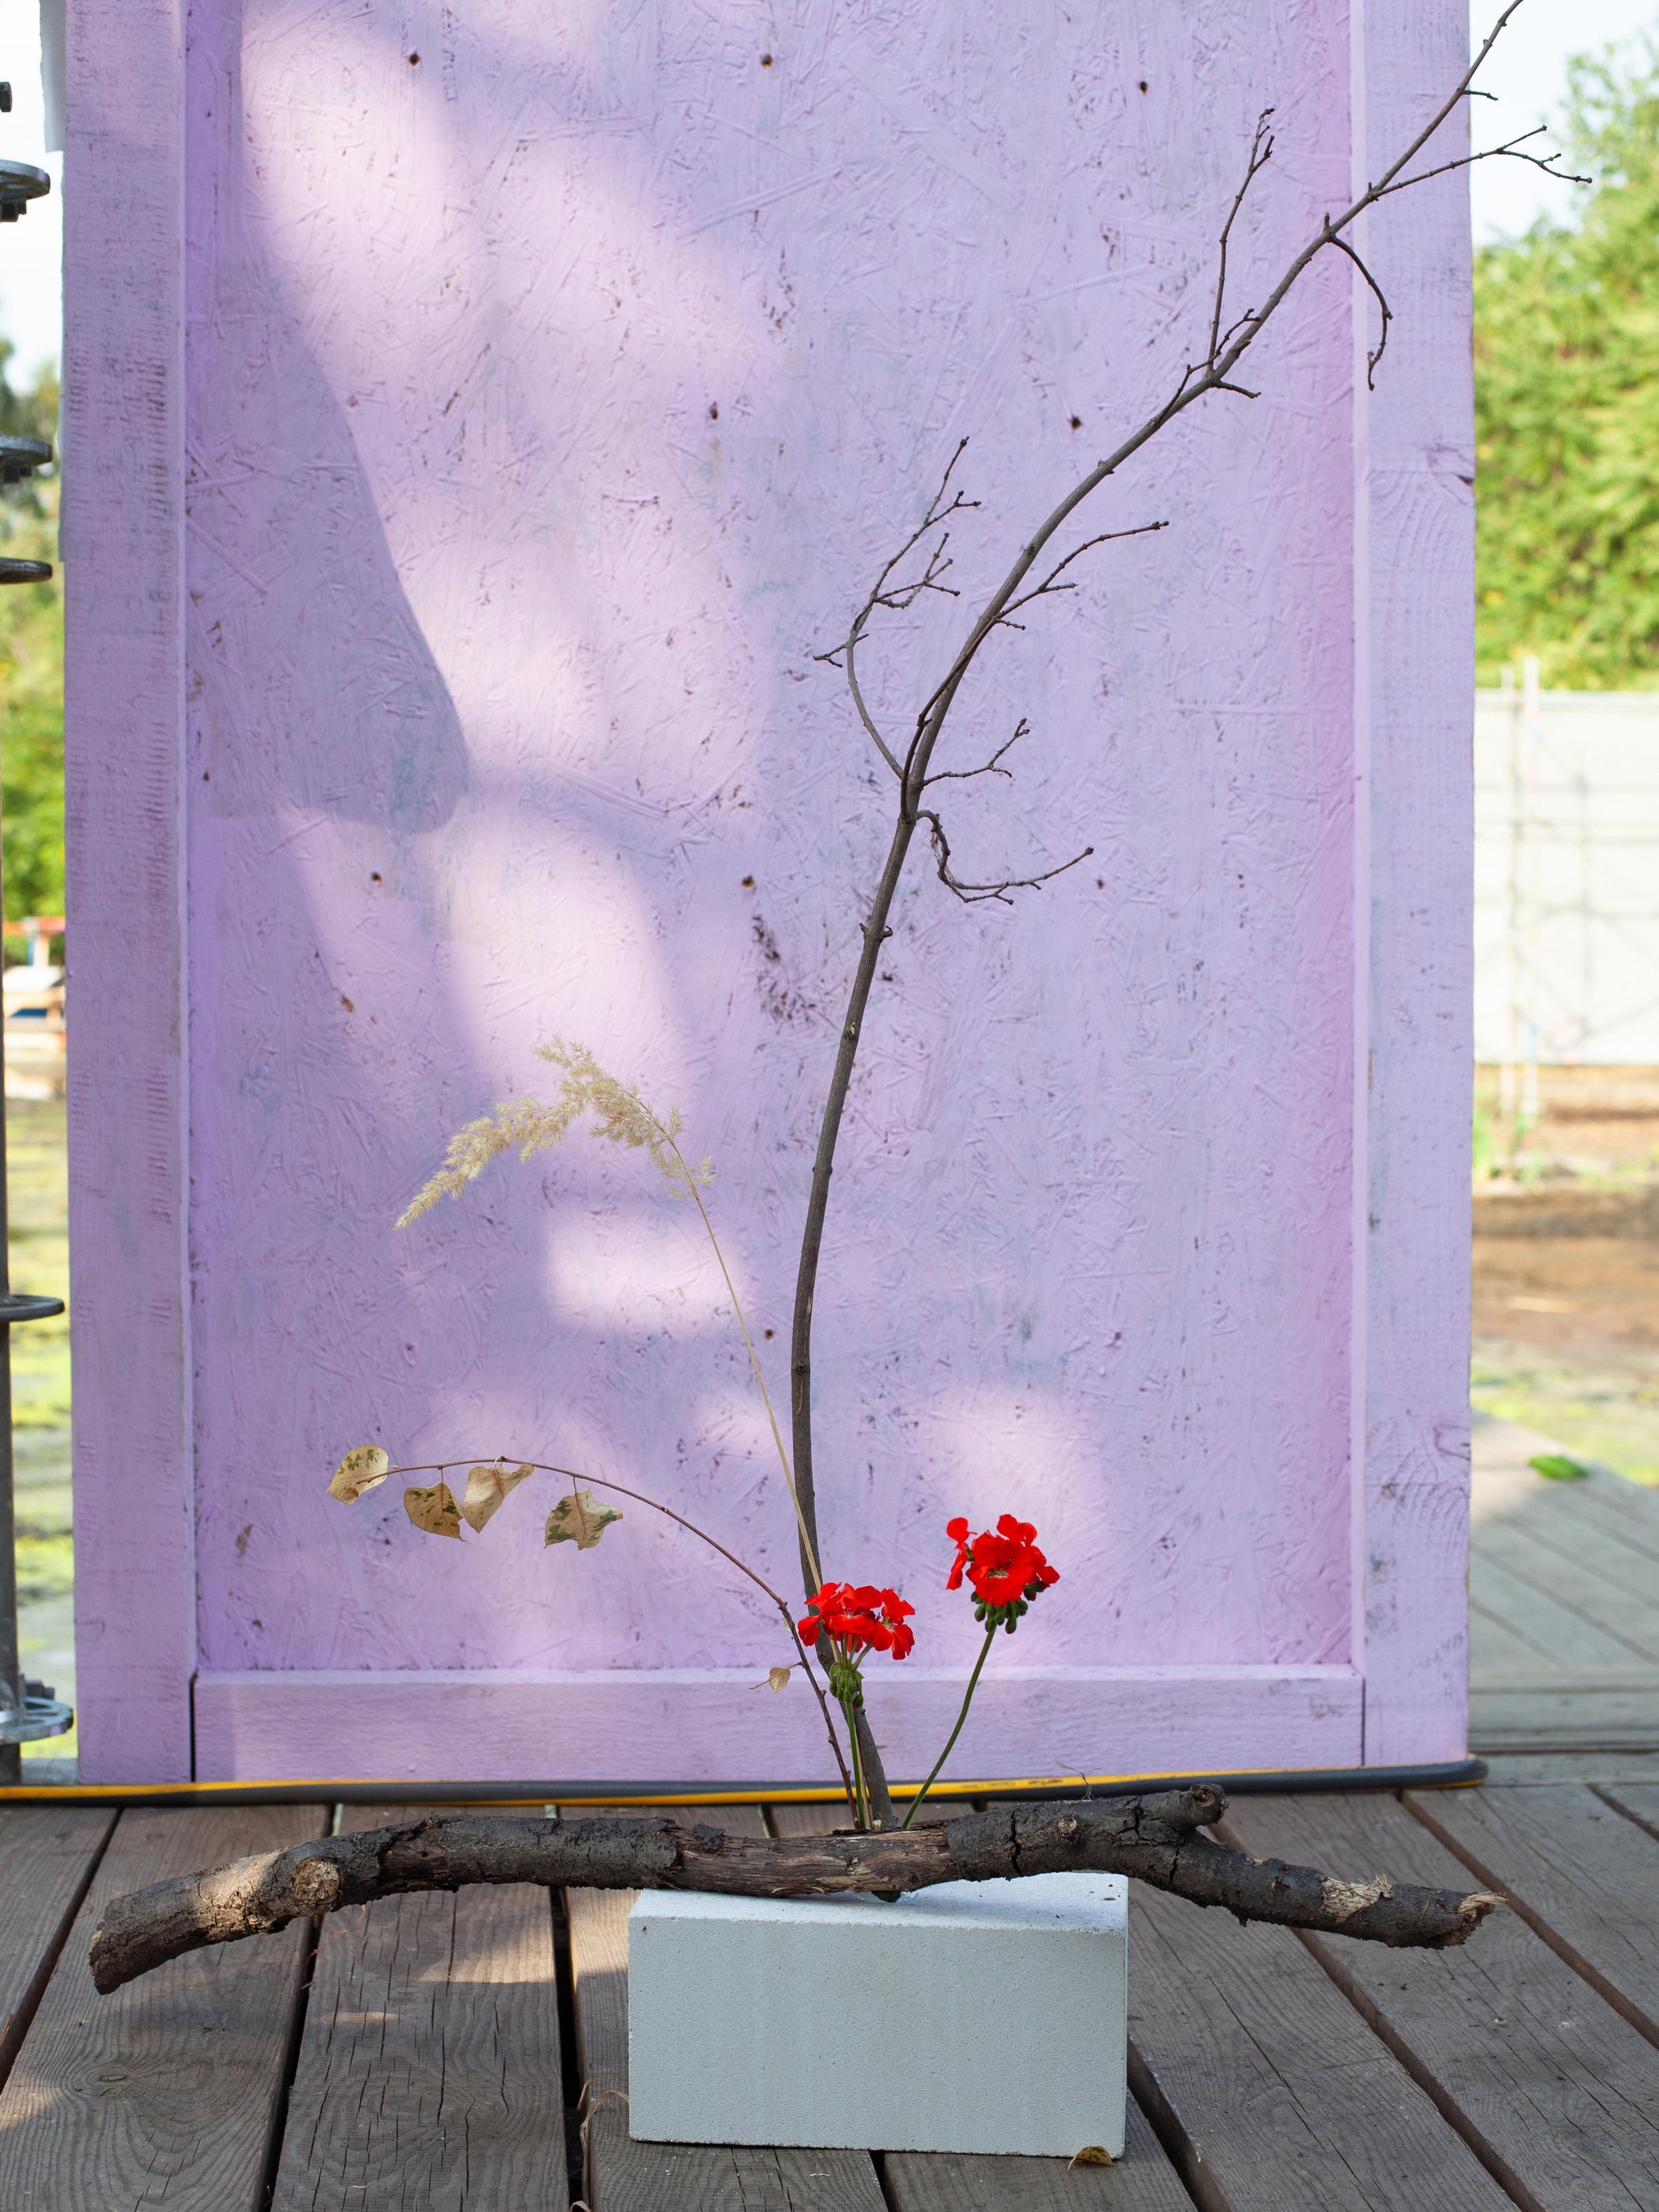 Perennialinstitute_arranging05.jpg